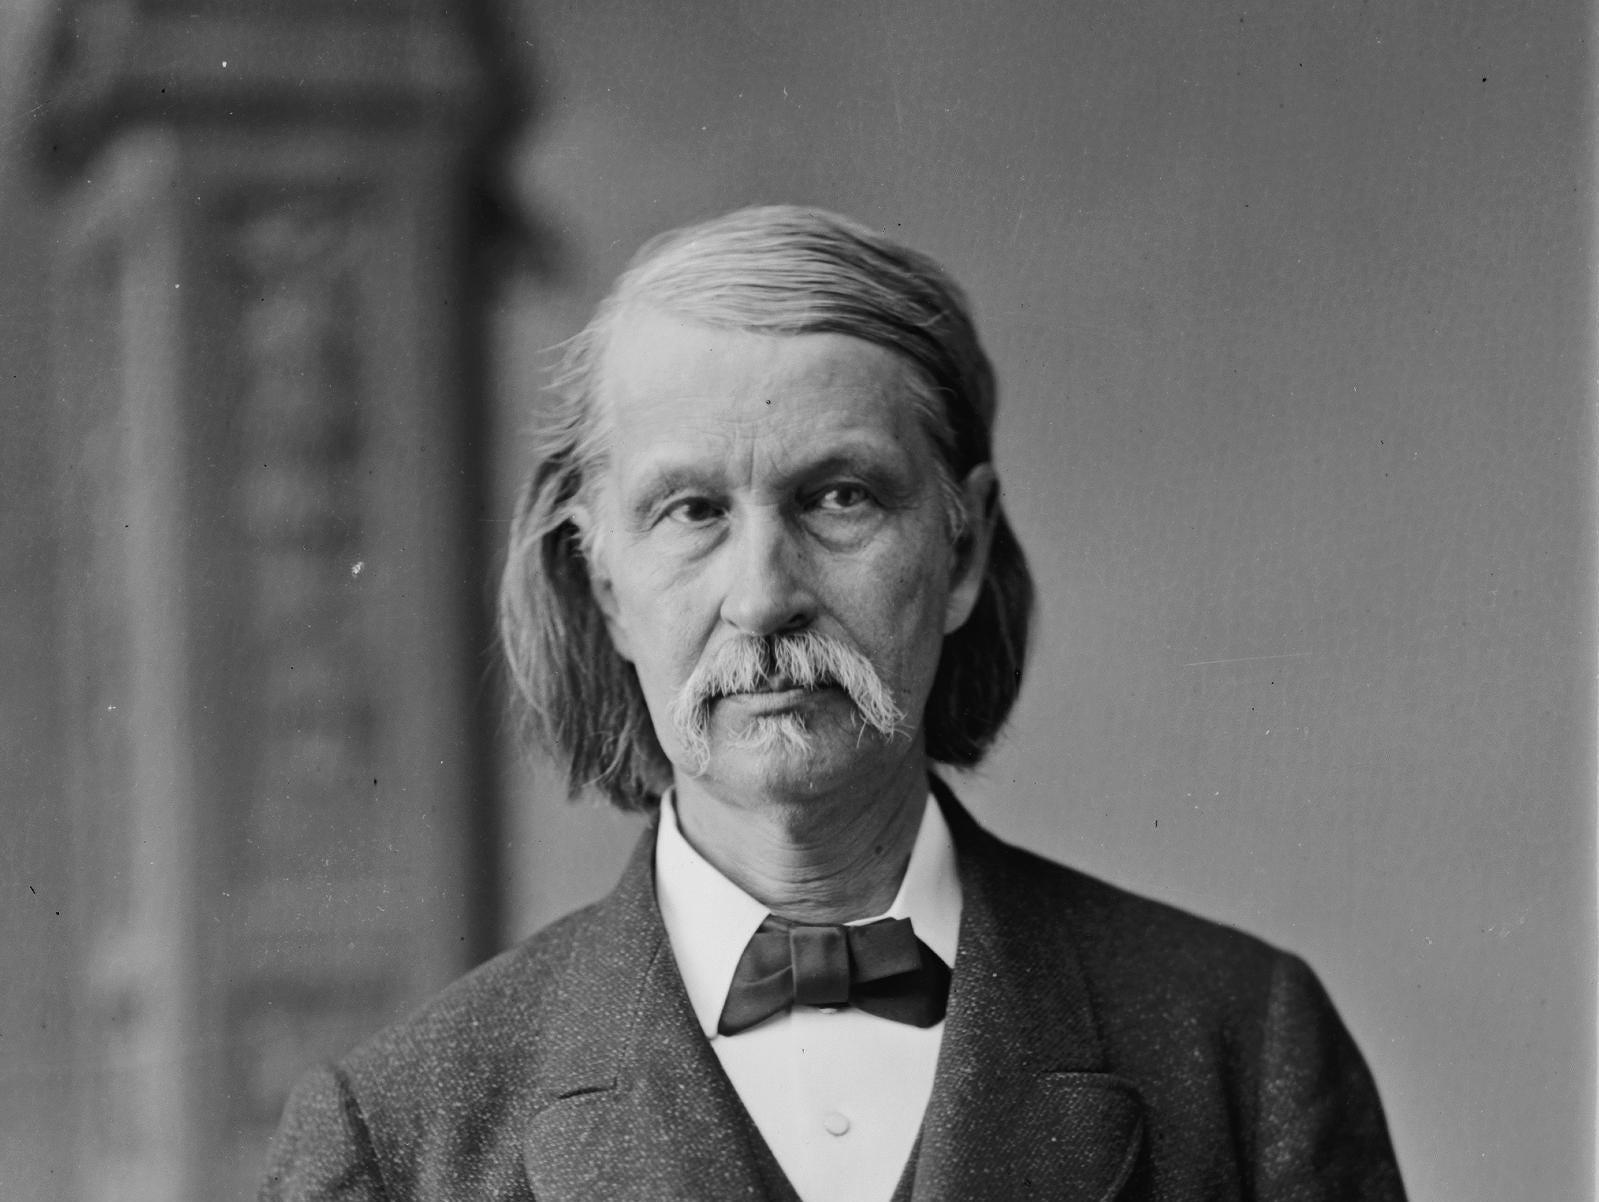 Horace Maynard (1814 - 1882), prominent Unionist in the Civil War, U.S. representative, U.S. Postmaster General.